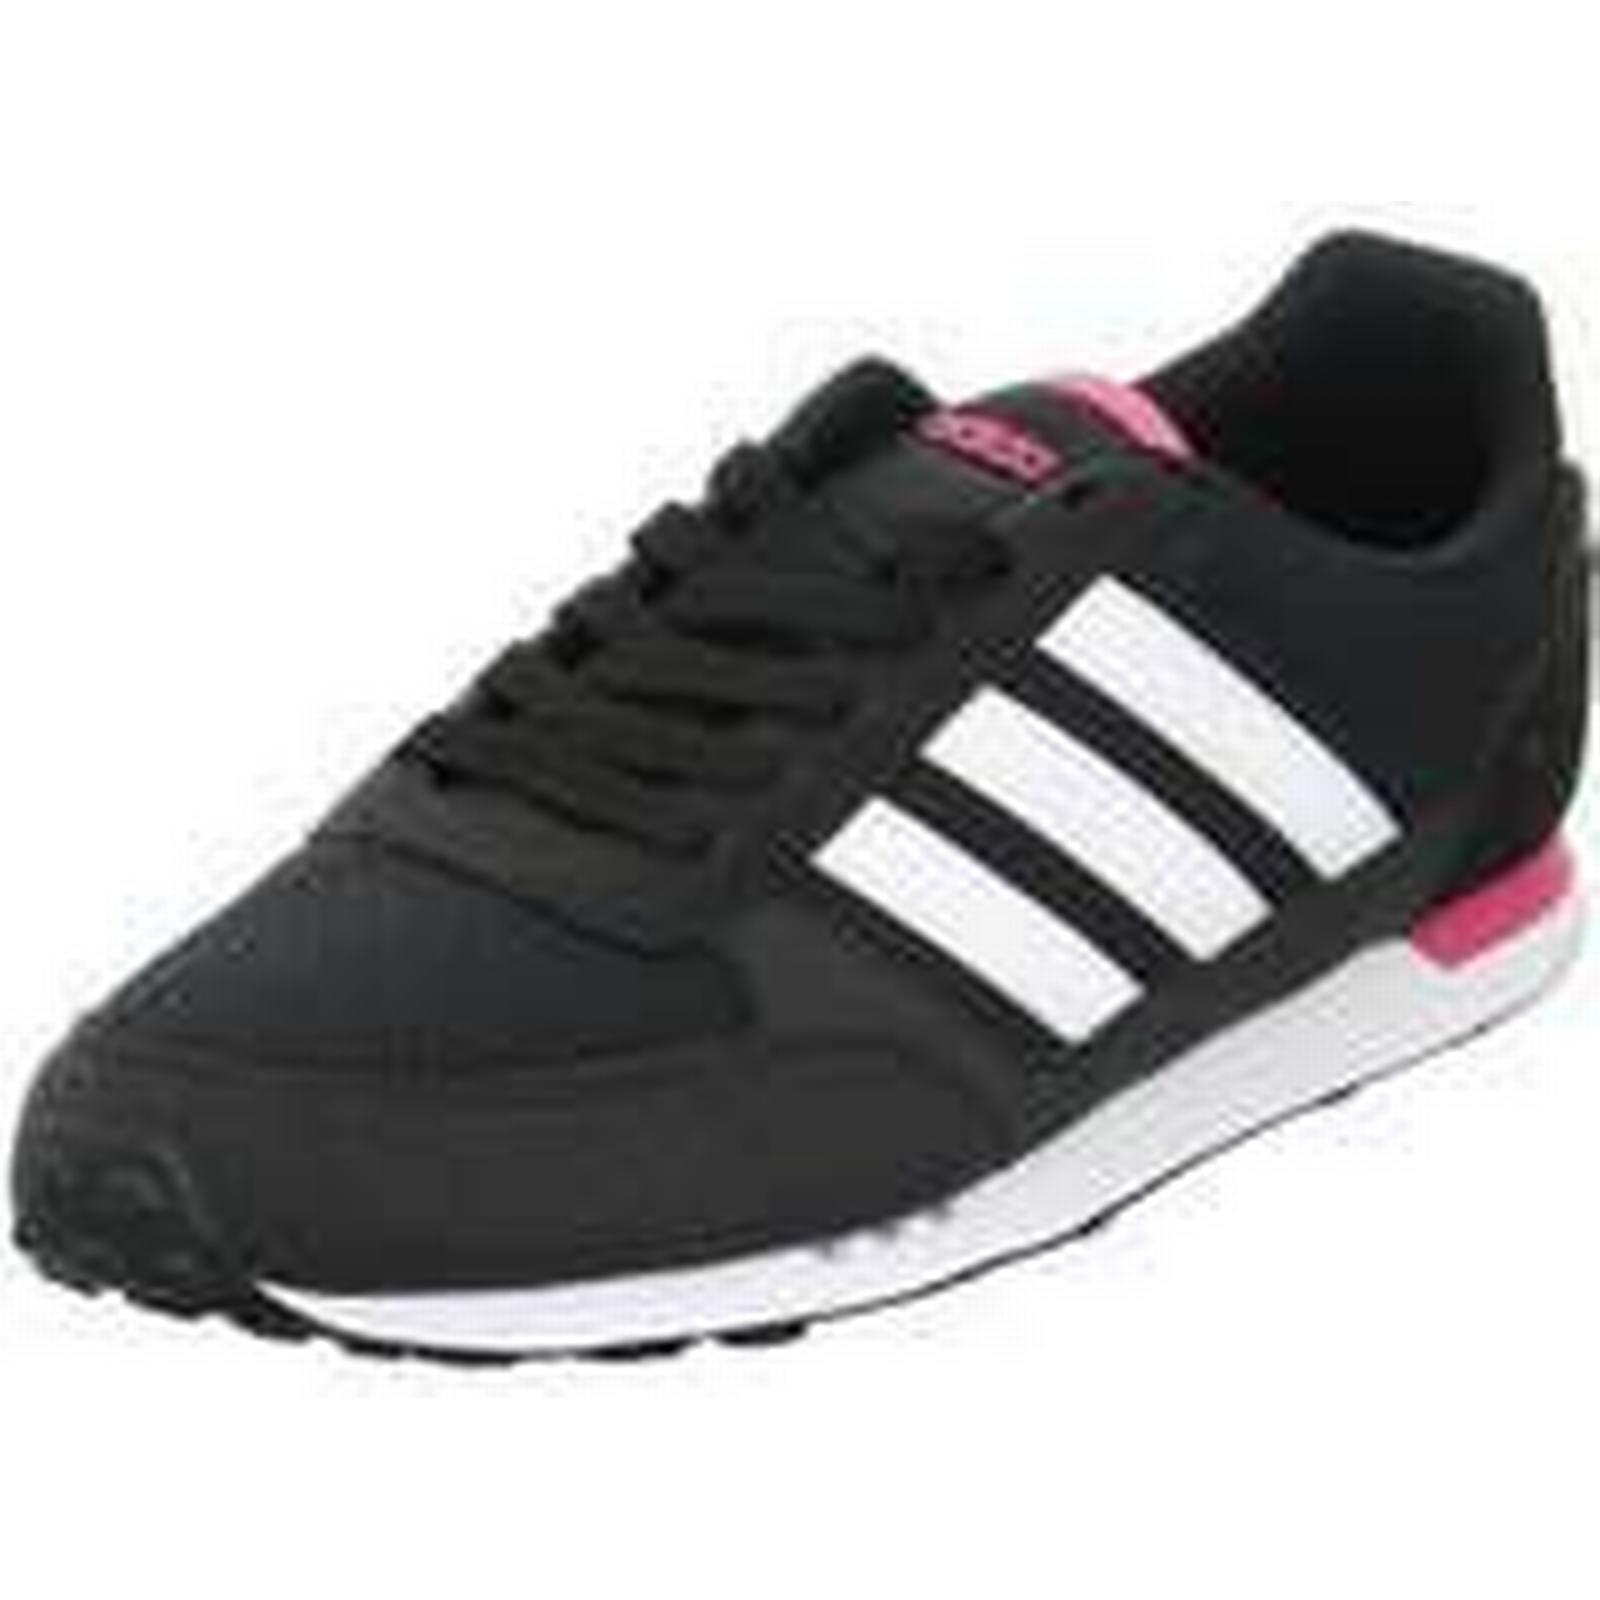 Adidas 60Citroen Chaussure Jusqu'à Femme Spartoo K1uJc3lFT5